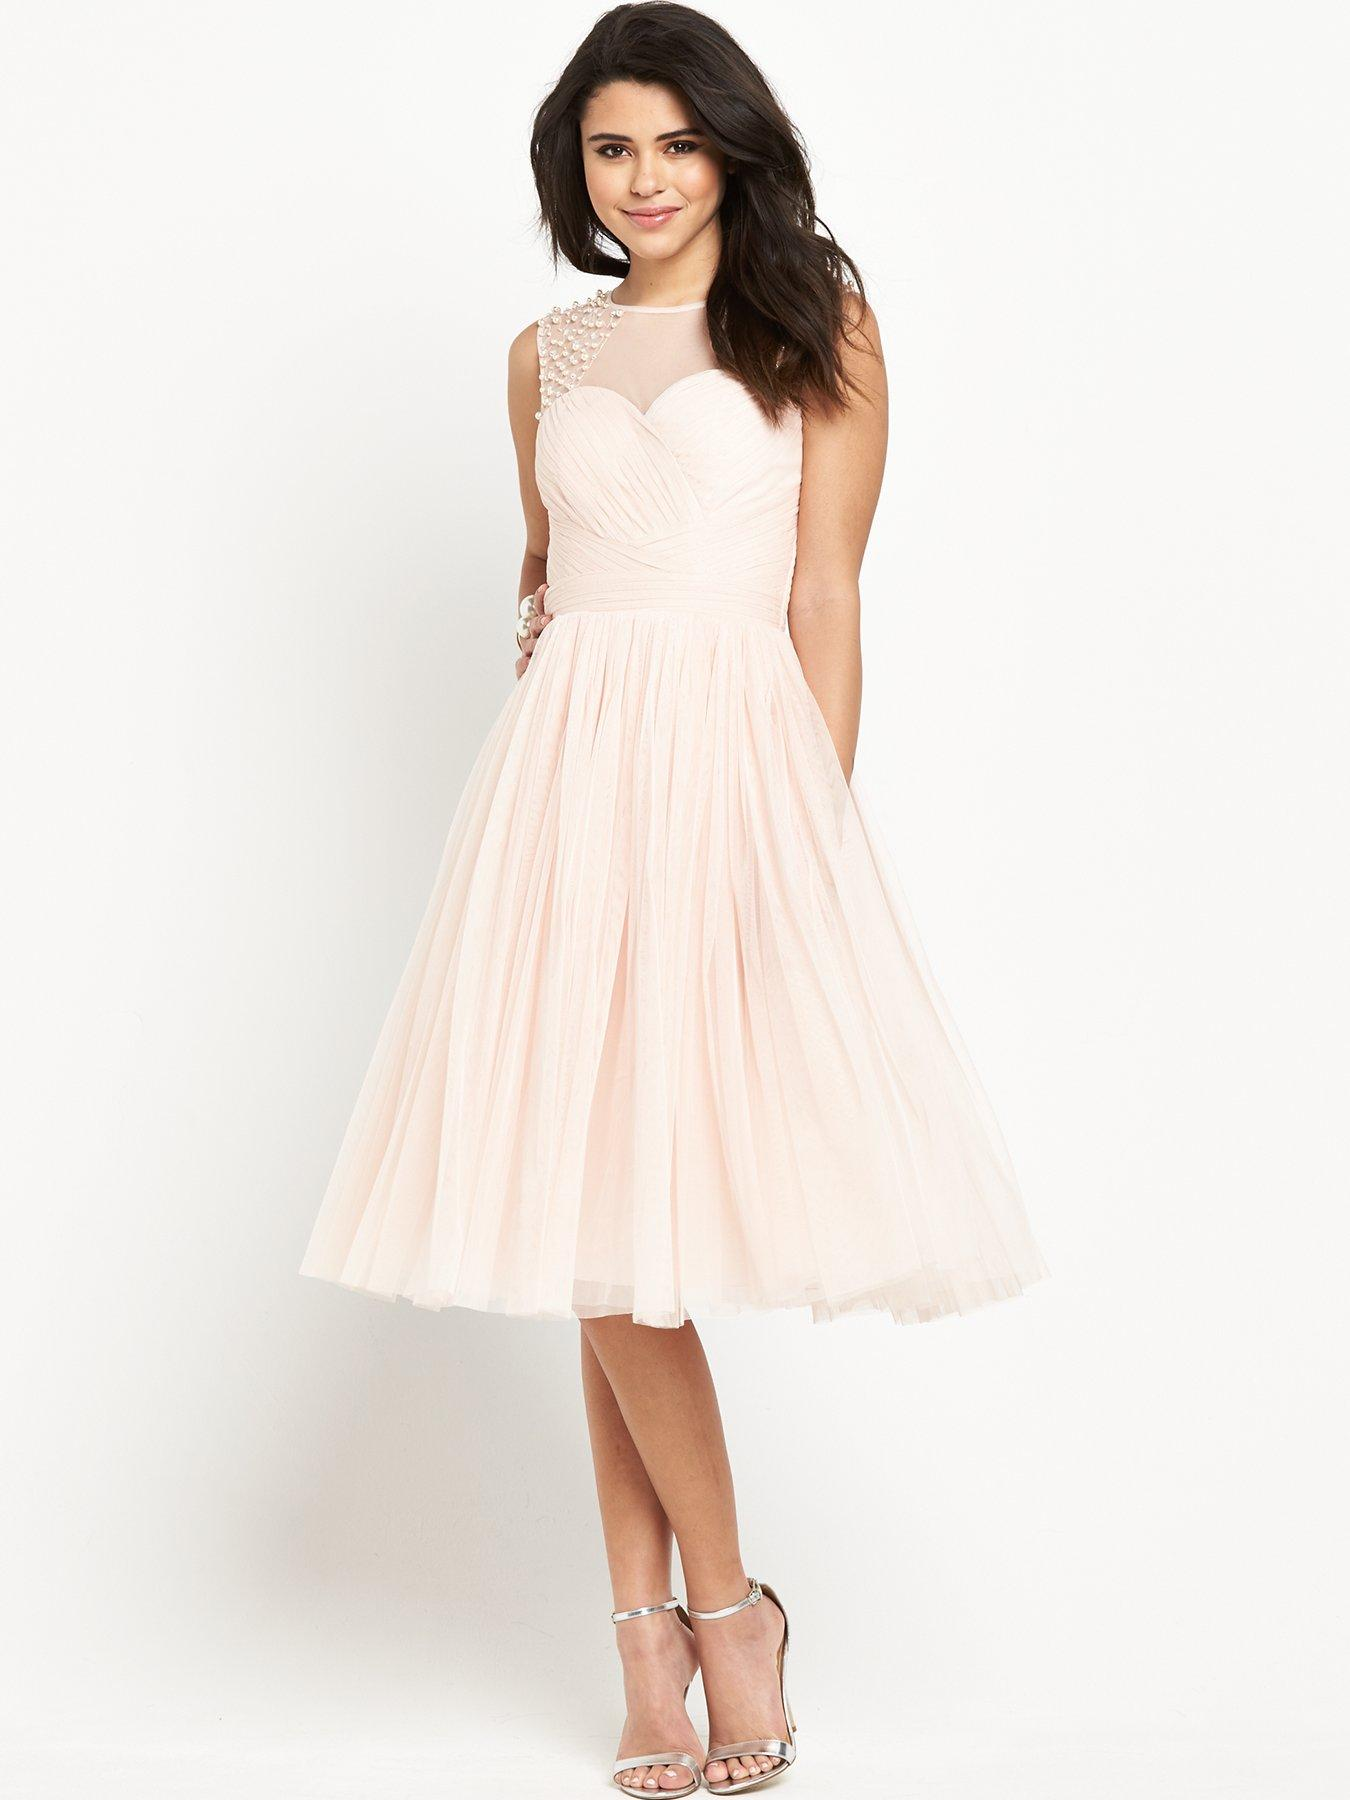 Sheer Midi Dress